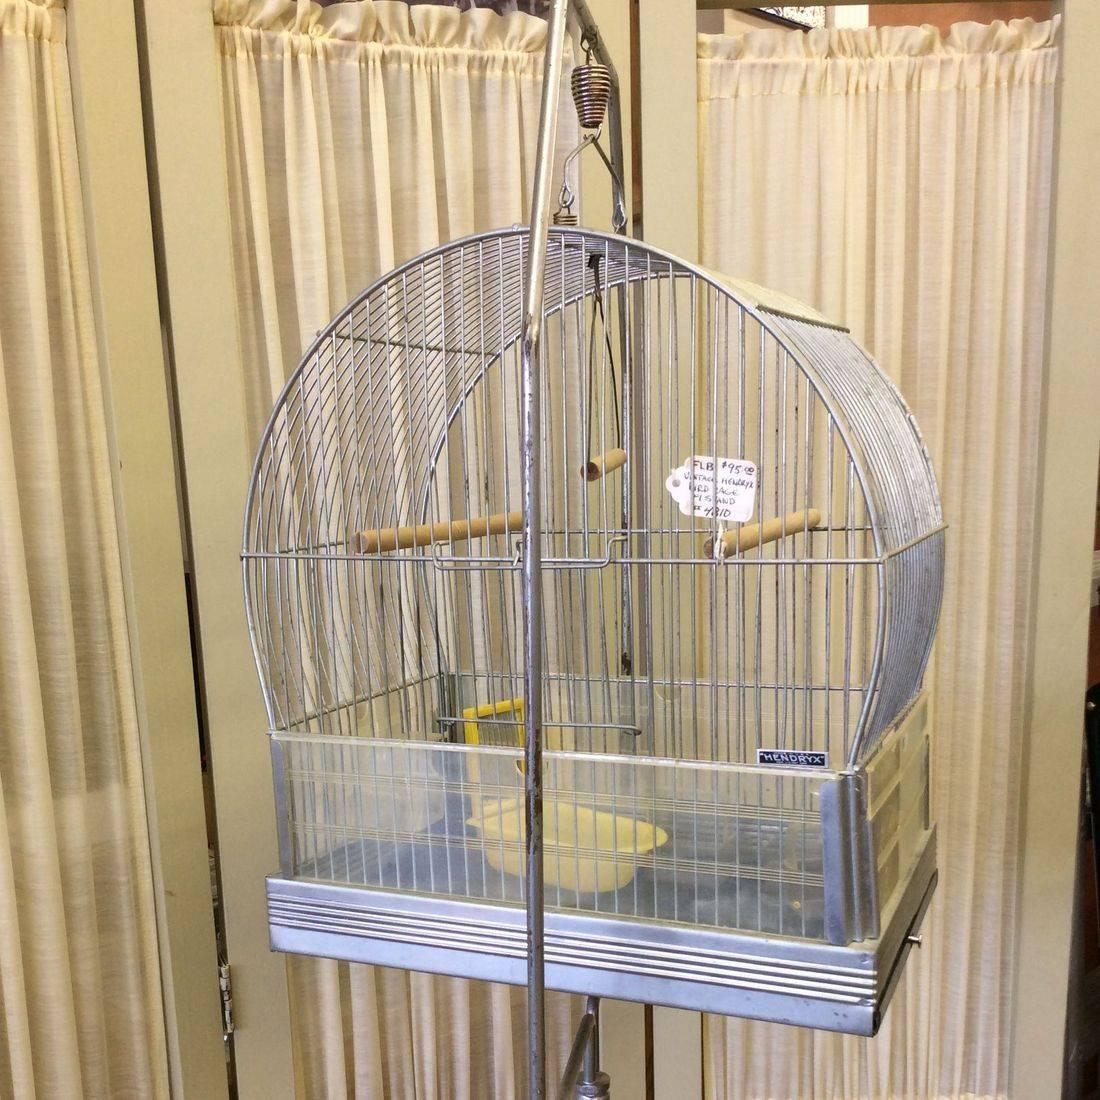 C. 1950's Hendryx Bird Cage